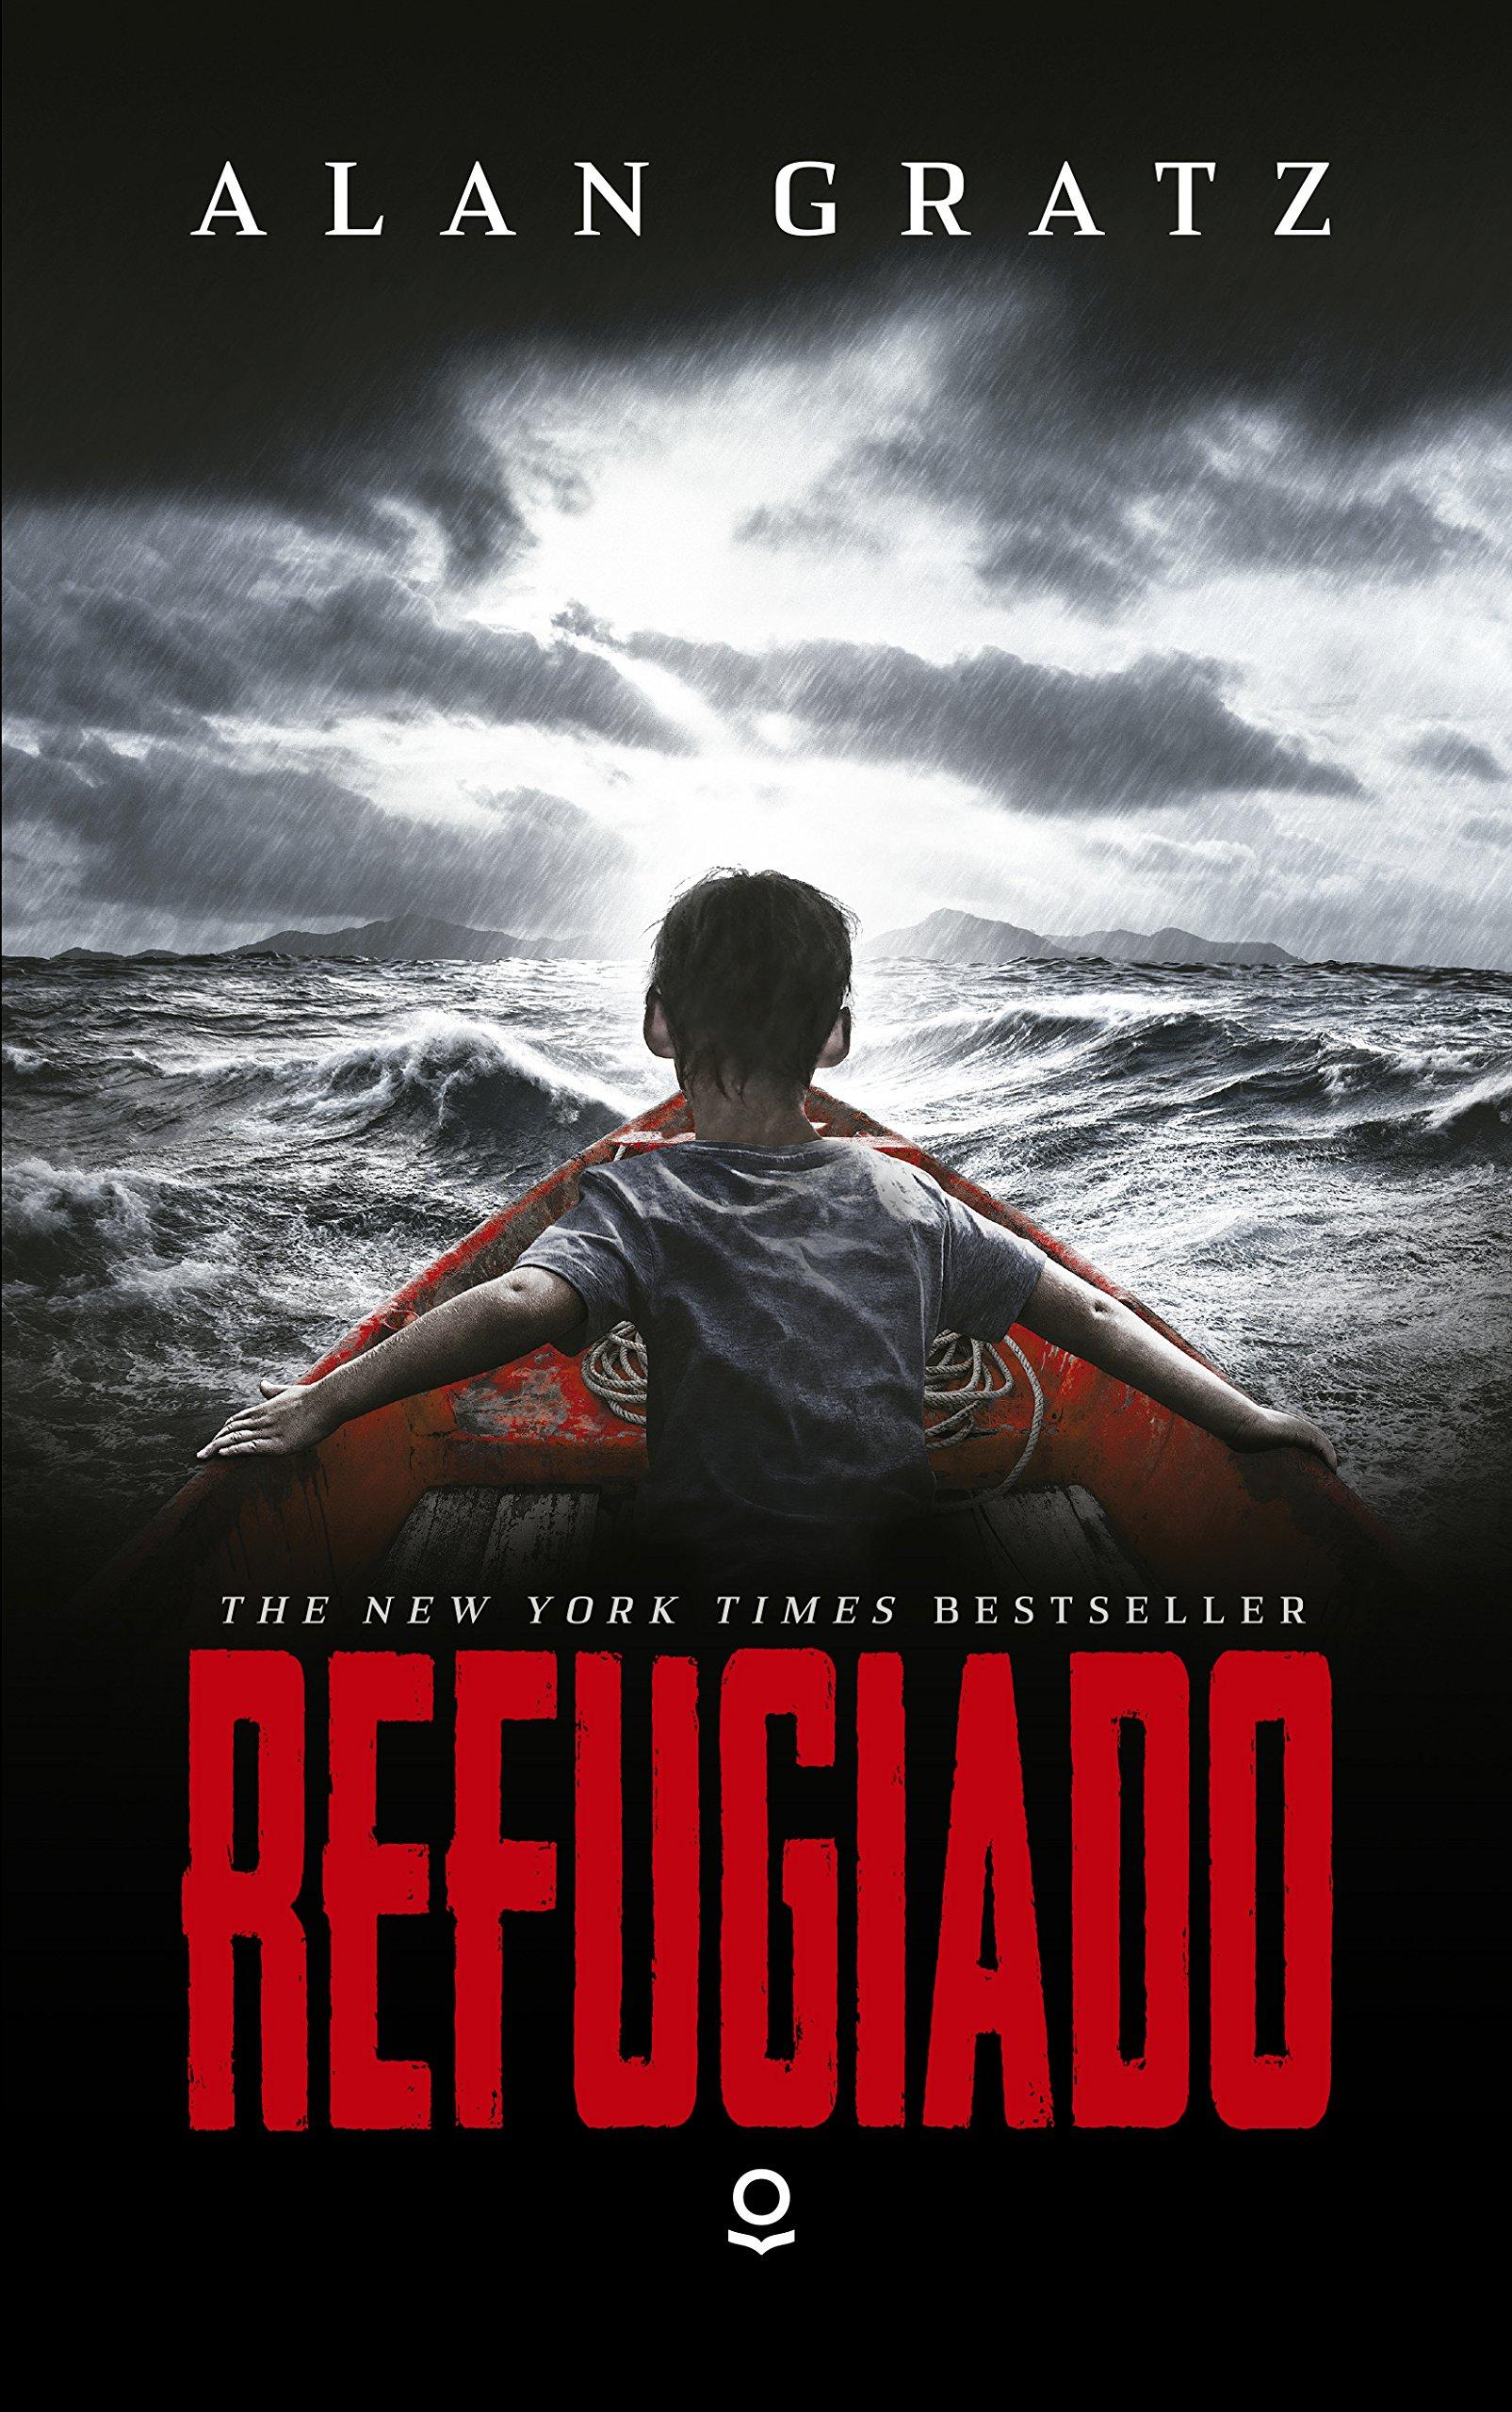 Refugiado: Amazon.es: Gratz, Alan, Hermoso Oliveras, Julio: Libros